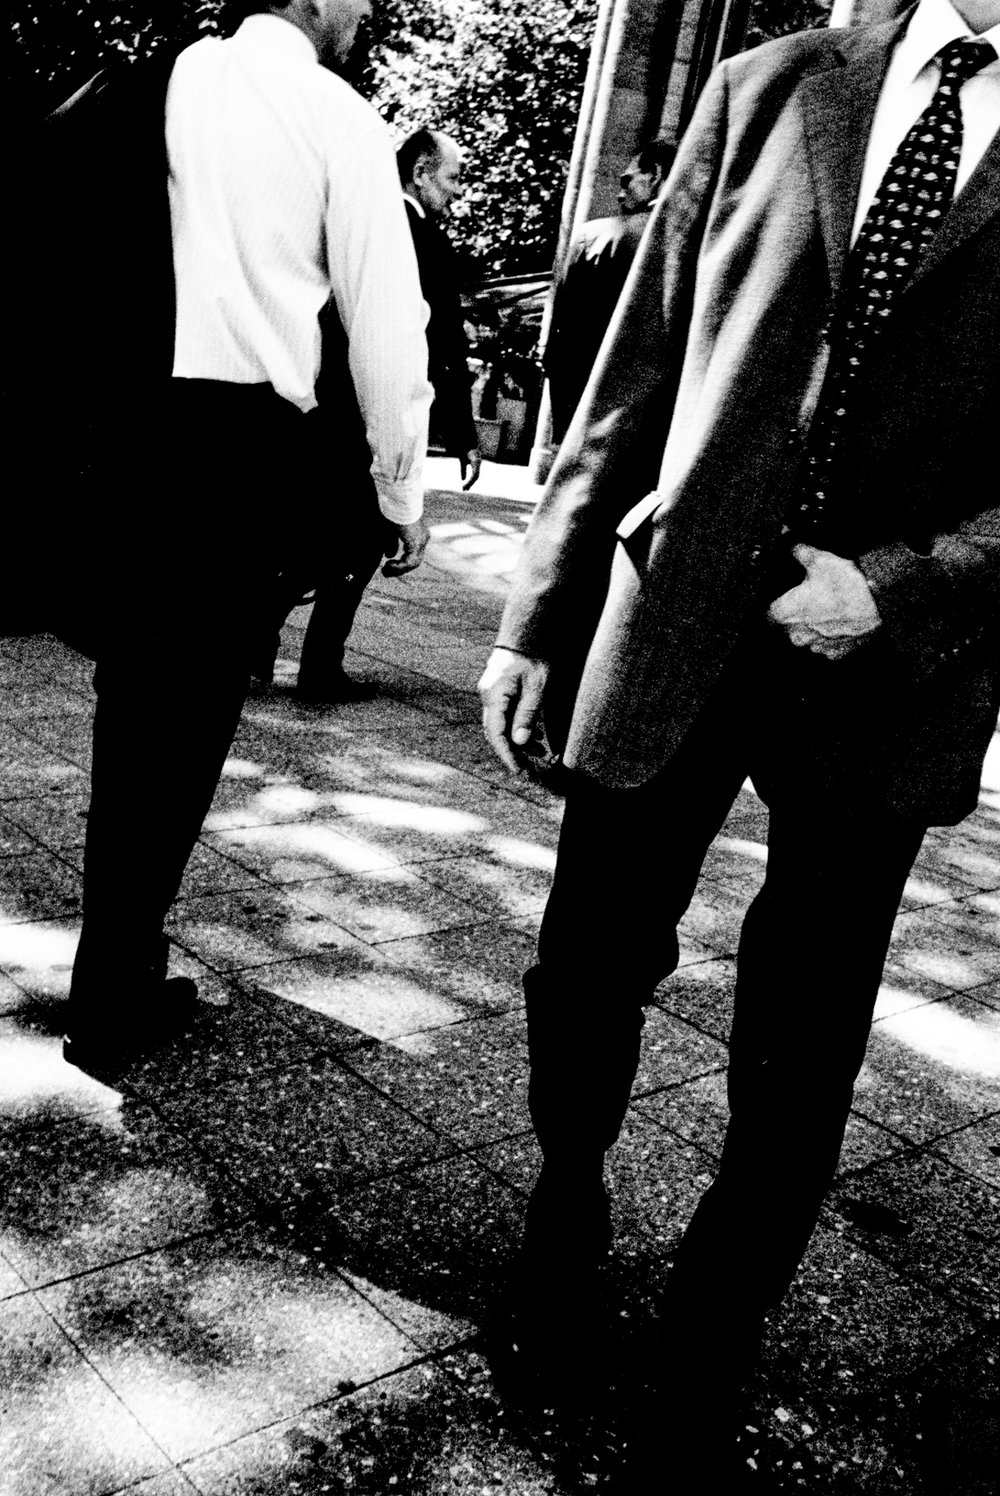 20140815-2014 07 - Street Berlin Analog_2558.jpg